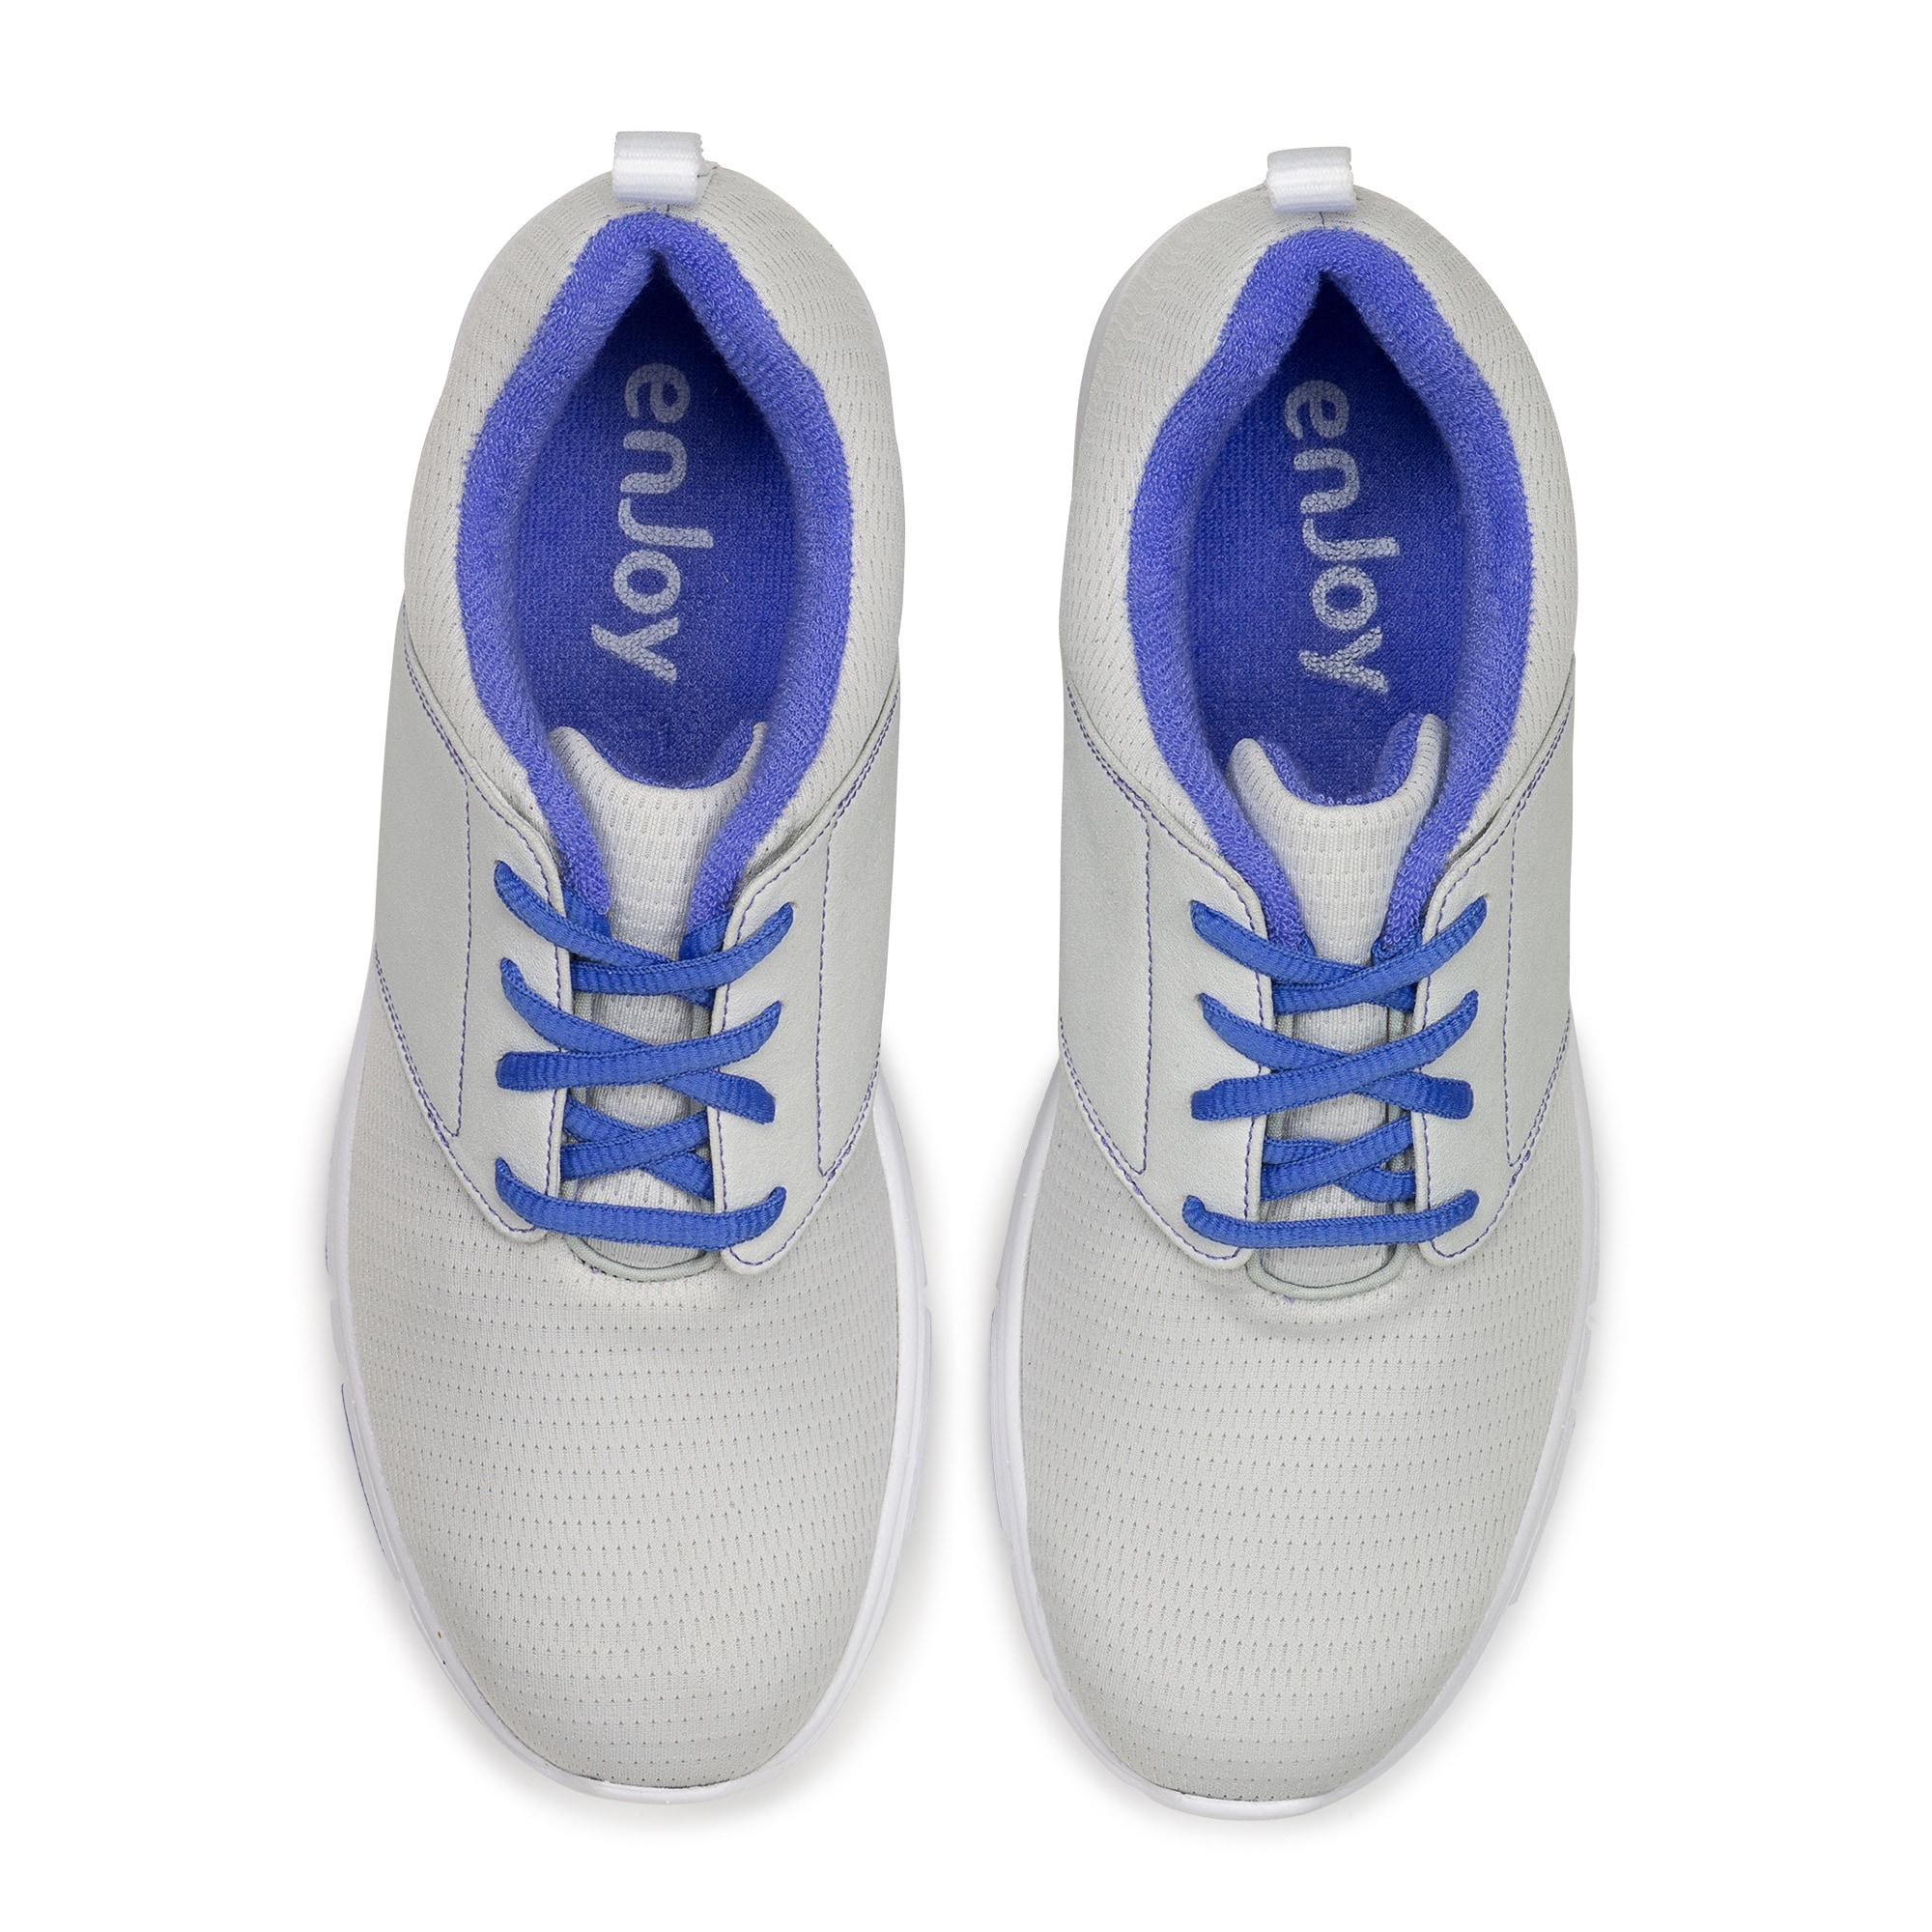 enJoy - Women's Golf Shoes   FootJoy